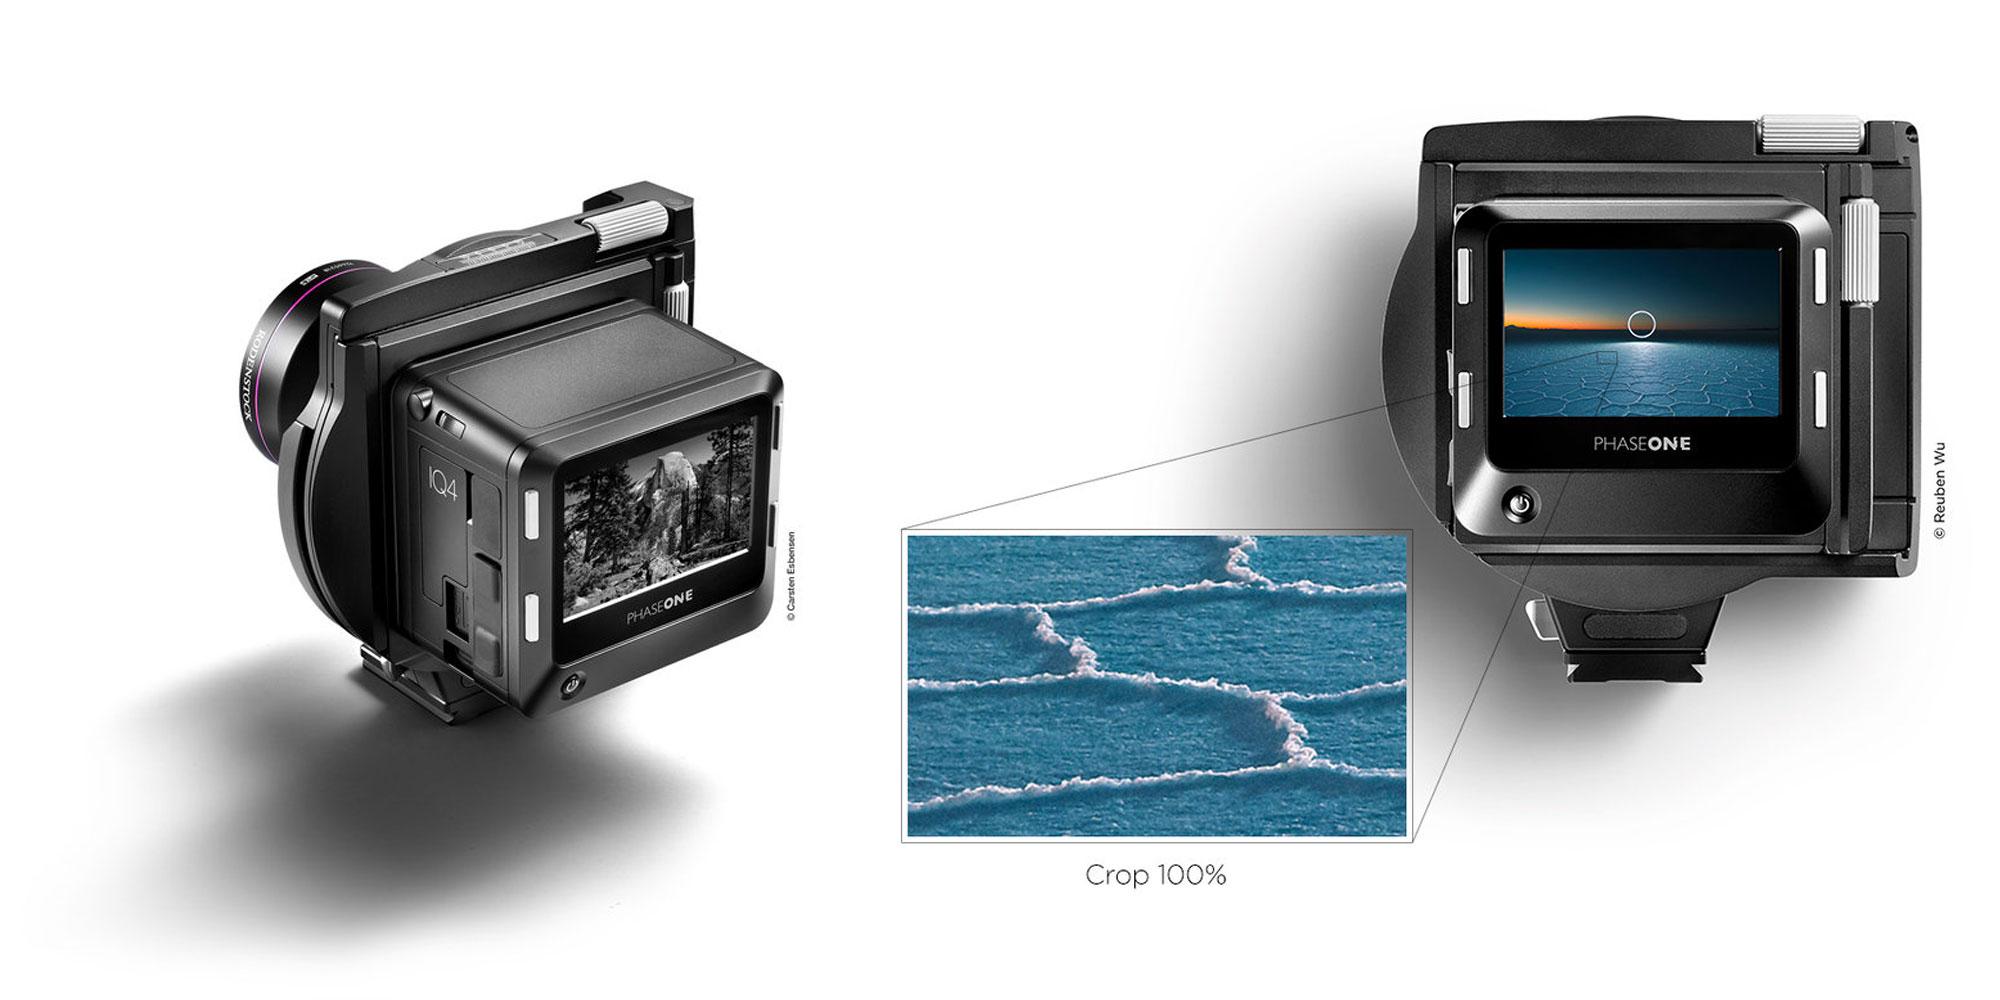 phase one 150 megapixel xt camera system